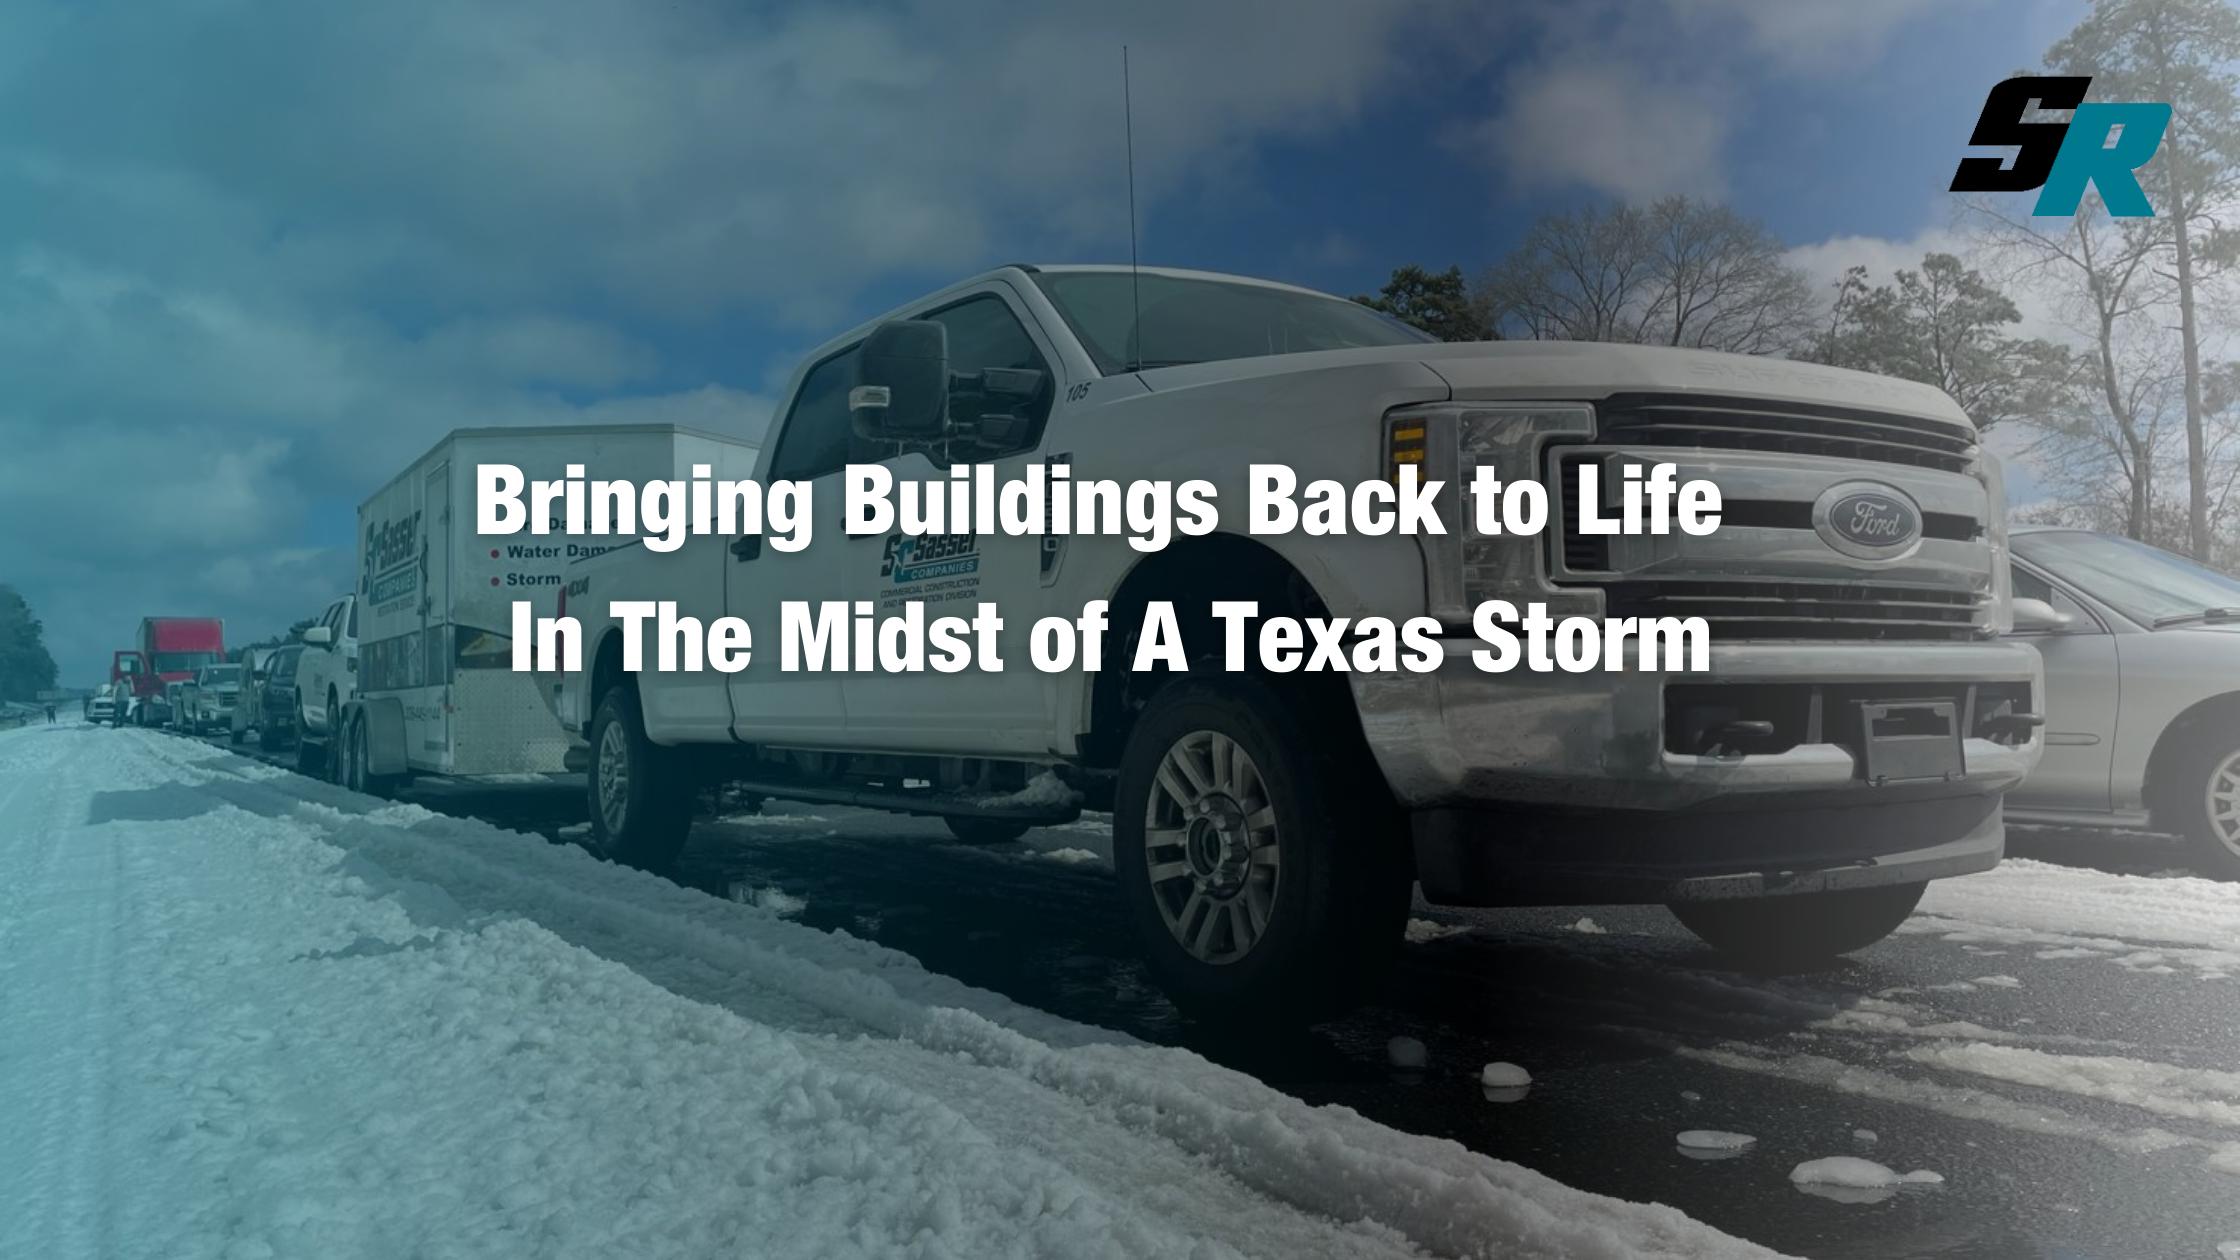 Sasser Restoration Brings Buildings Back to Life in Texas